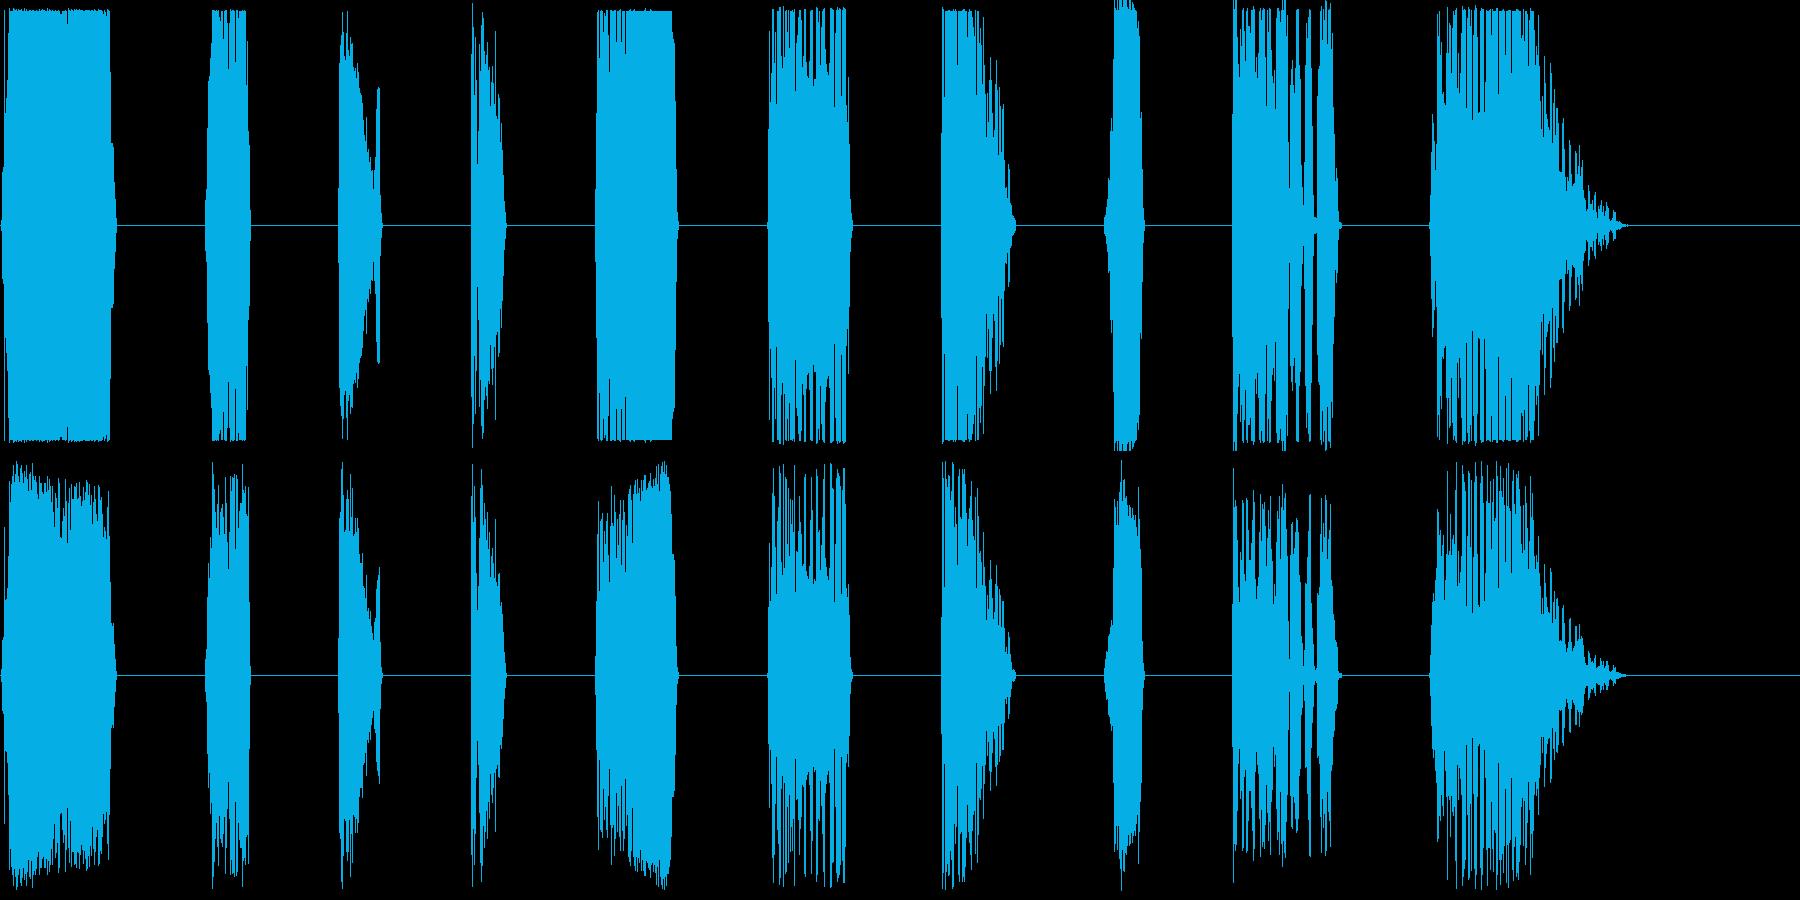 DJレーザーバースト1-10の再生済みの波形